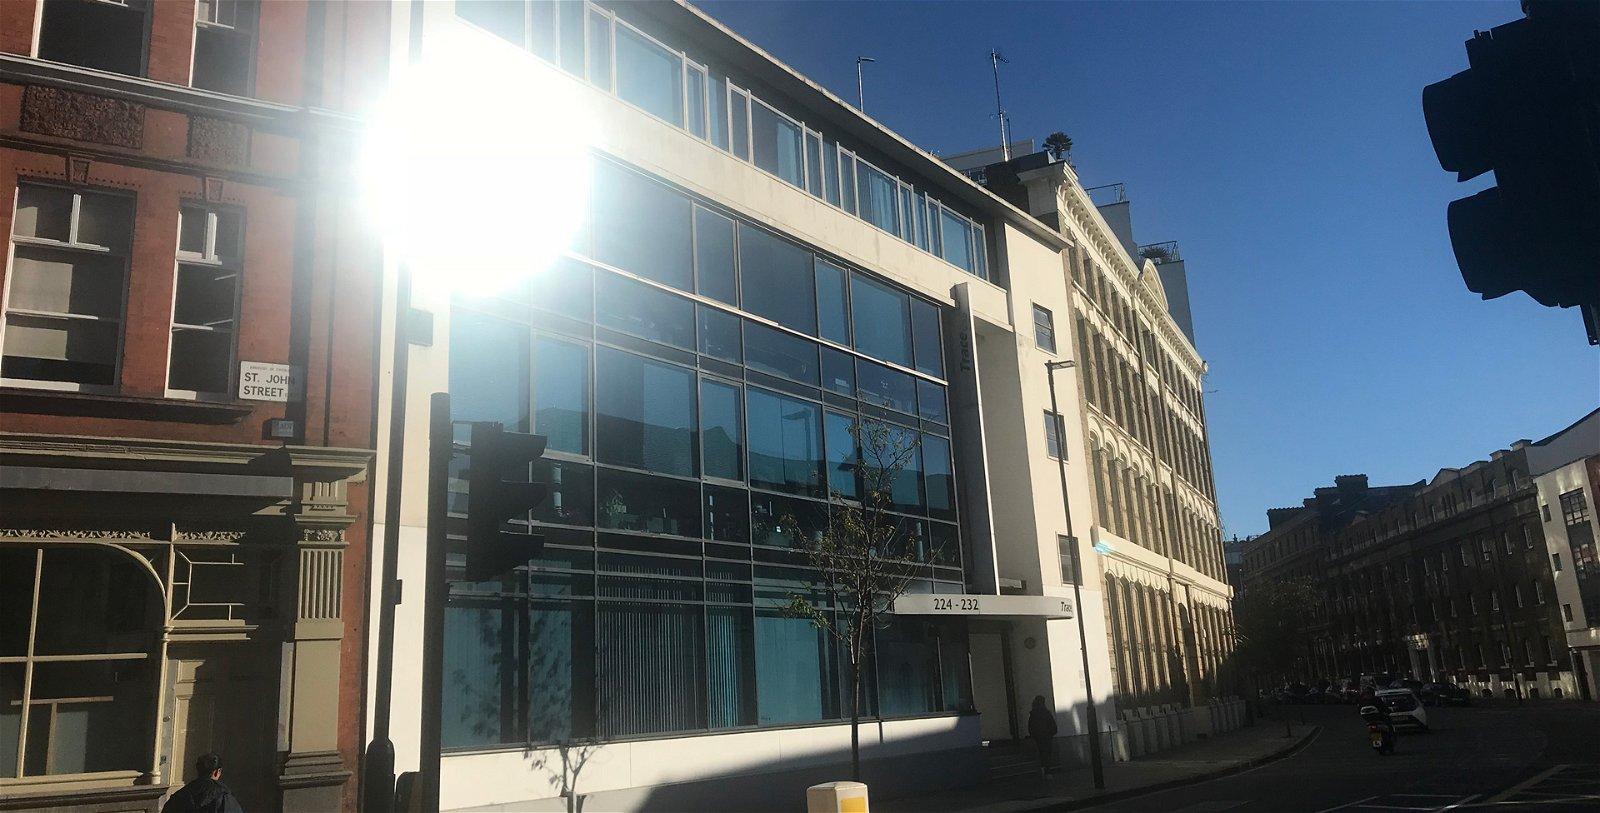 232 St John Street - property management software